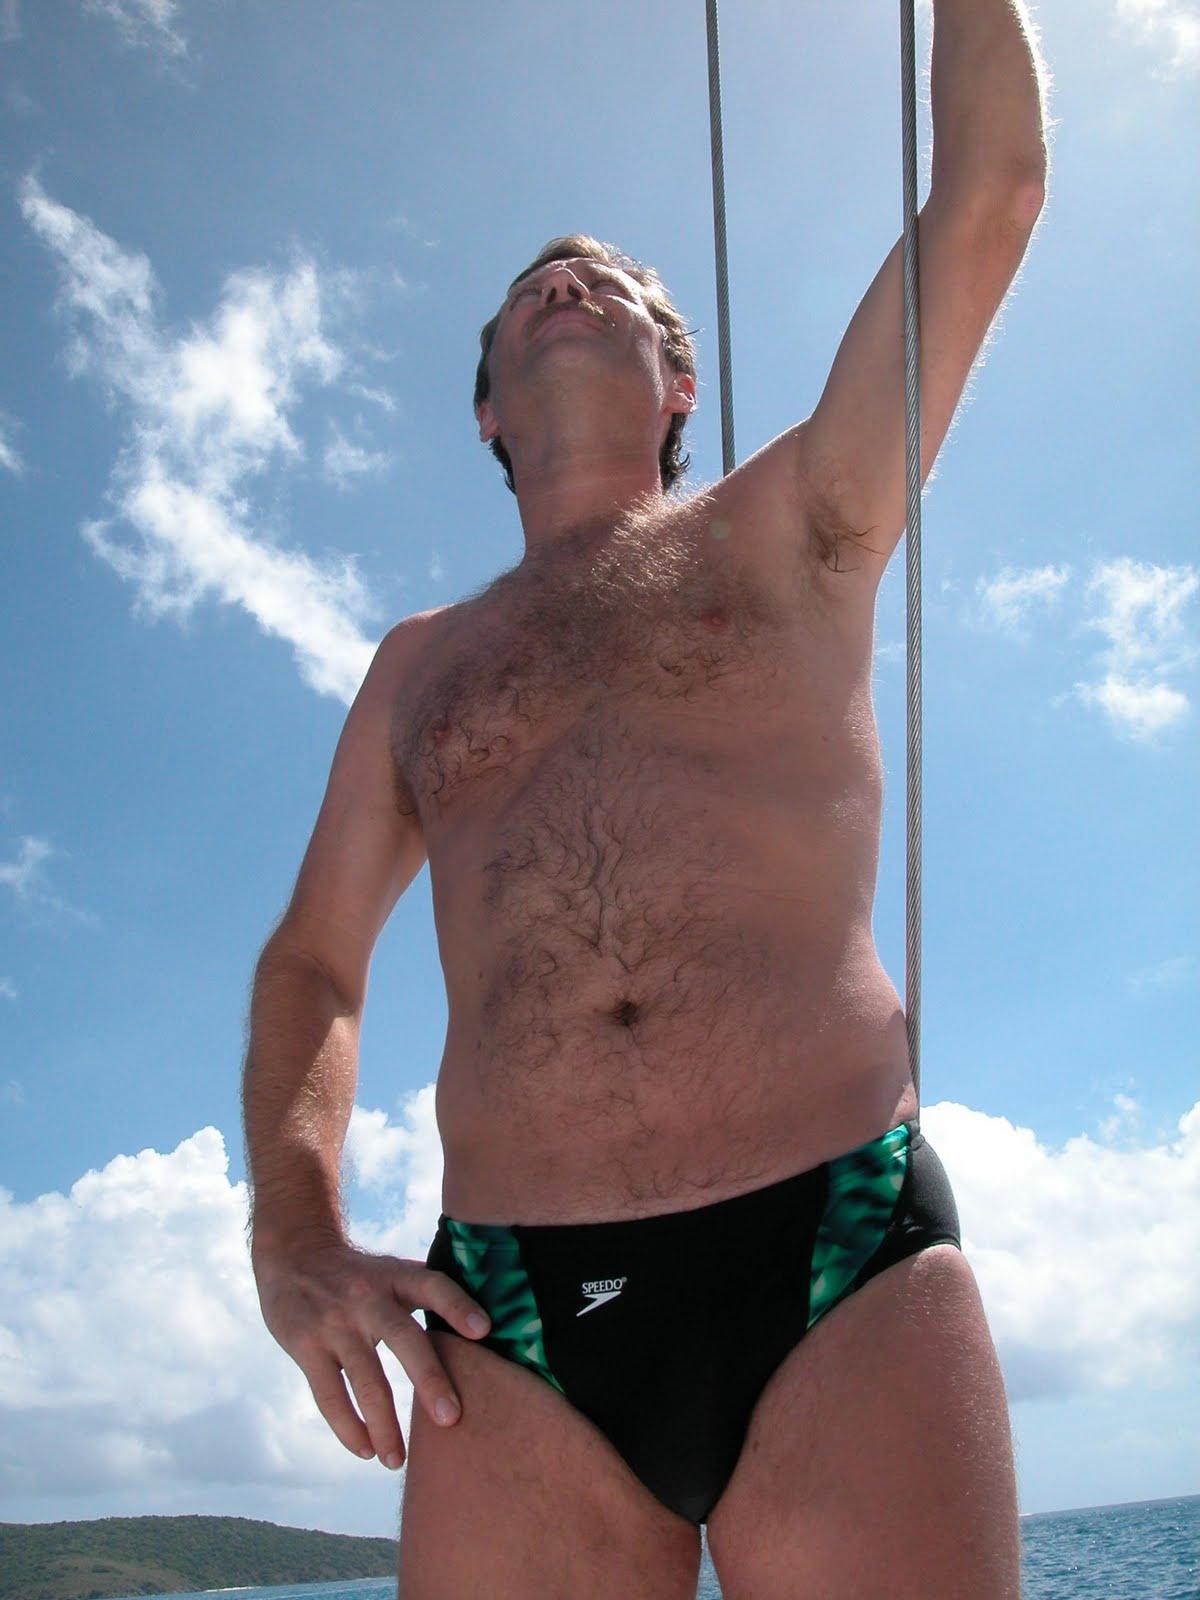 øktxlyst menn smerter øverst i magen